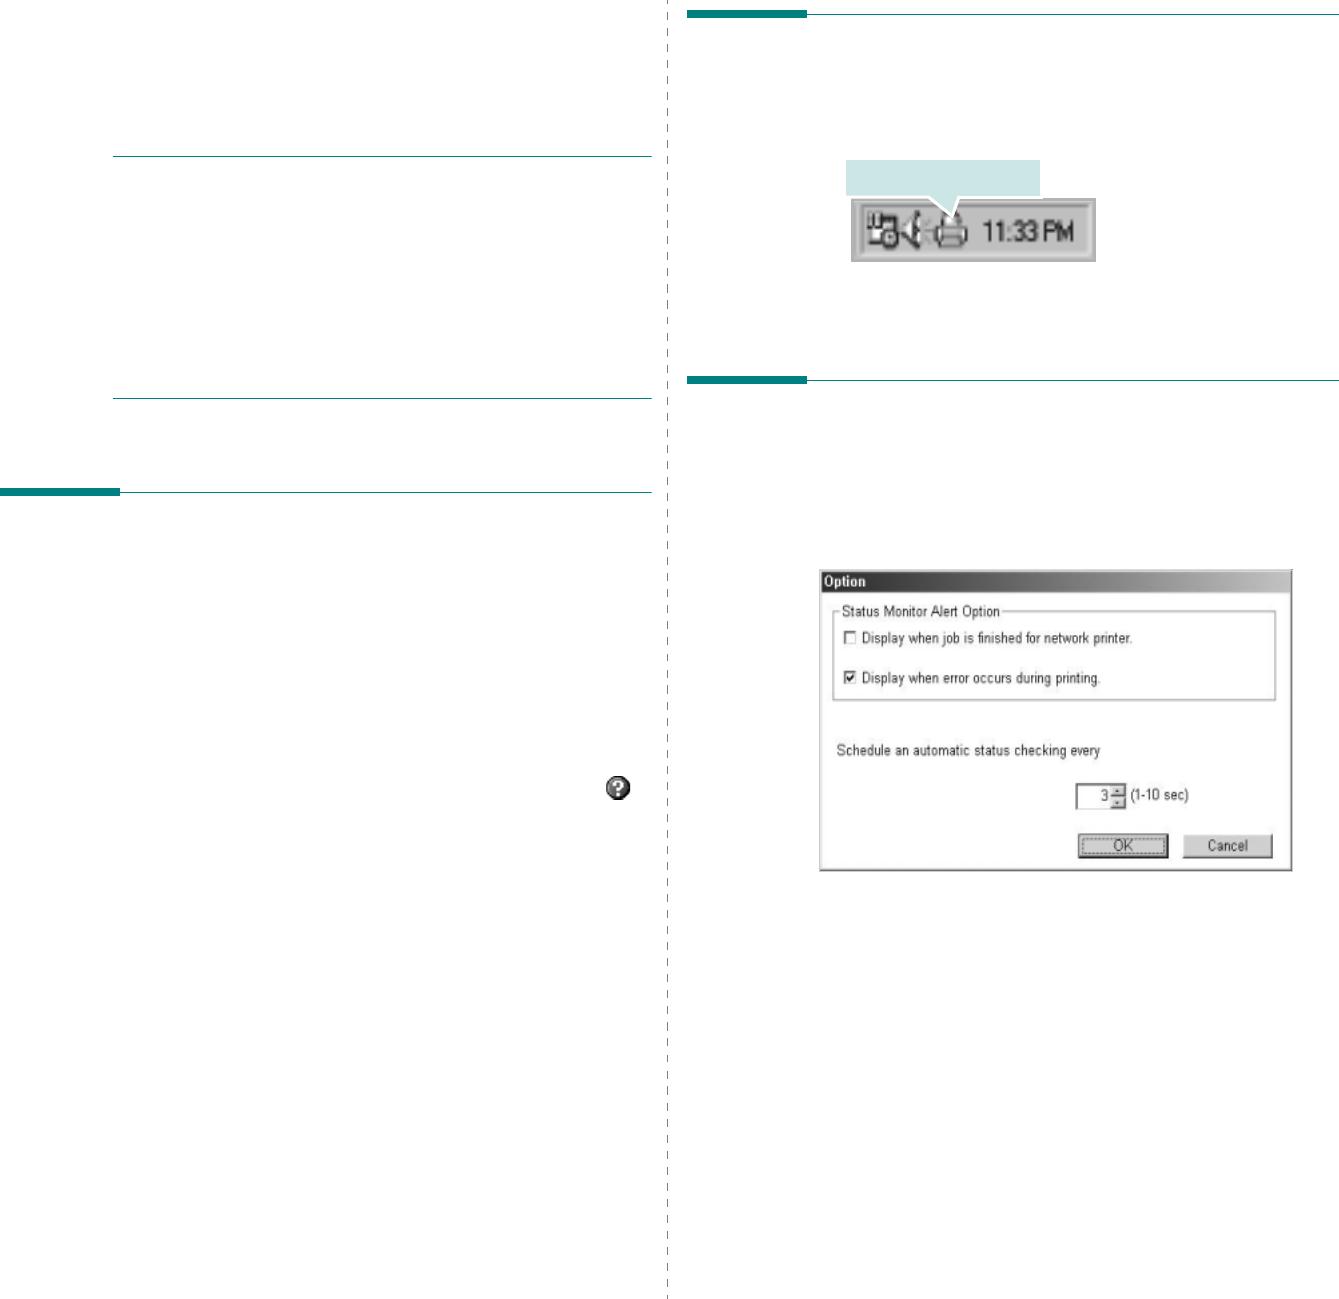 Ricoh Aficio Sp 5100n Users Manual Strap St 3 W Using Utility Applications